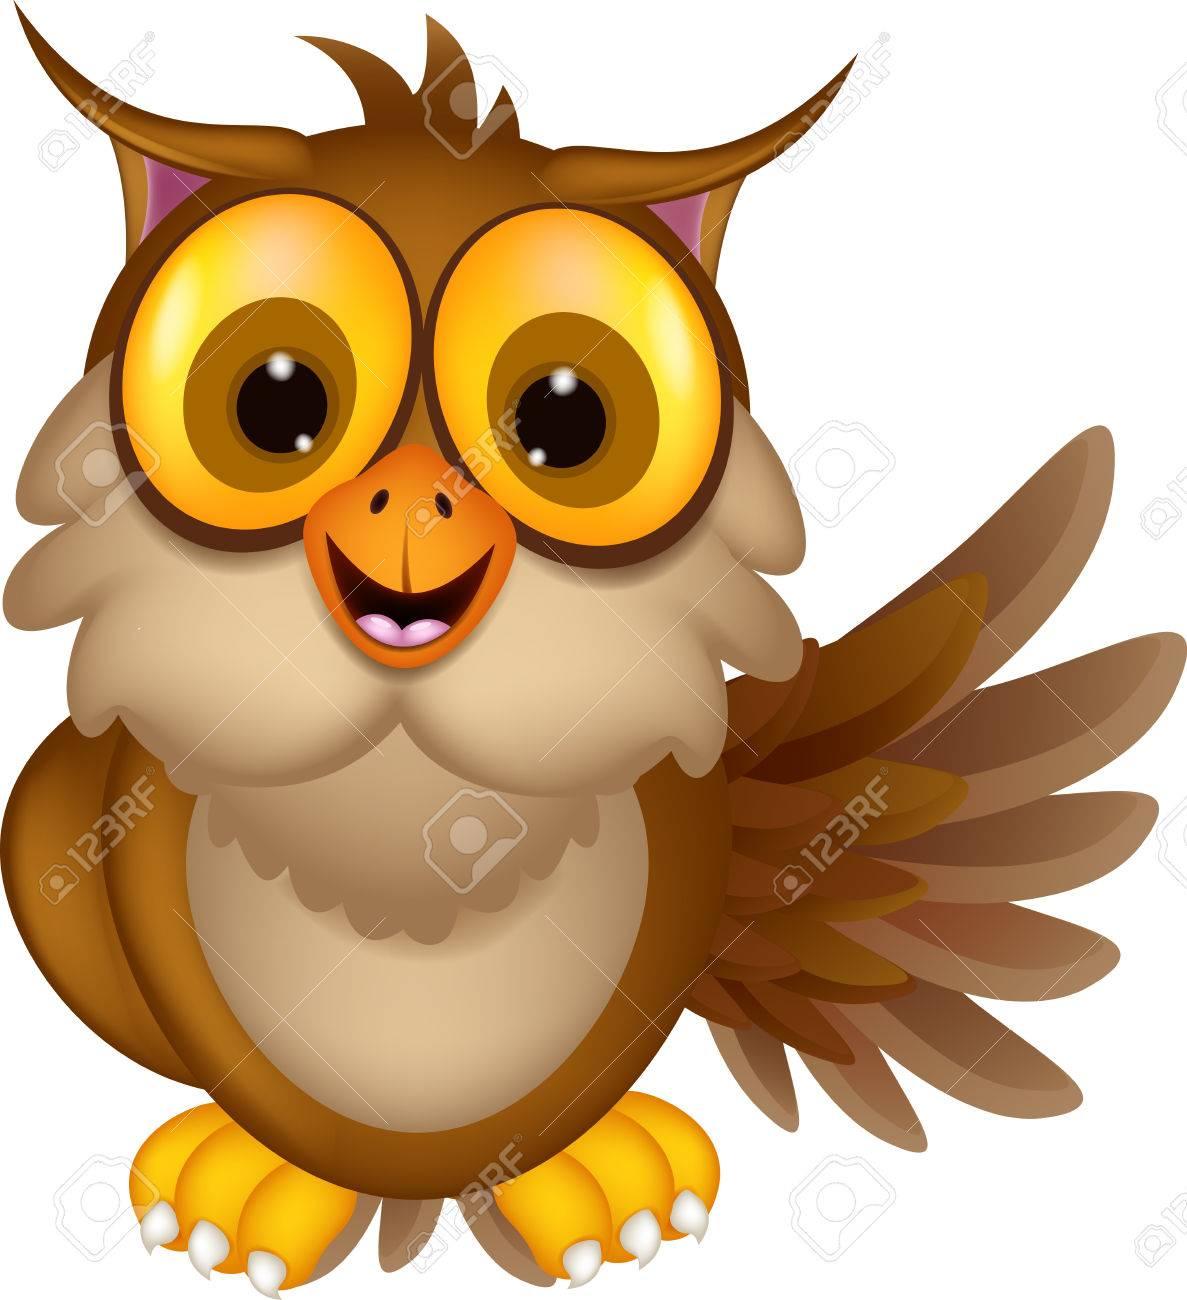 Cute owl cartoon waving royalty free cliparts vectors and stock cute owl cartoon waving stock vector 23848388 voltagebd Choice Image